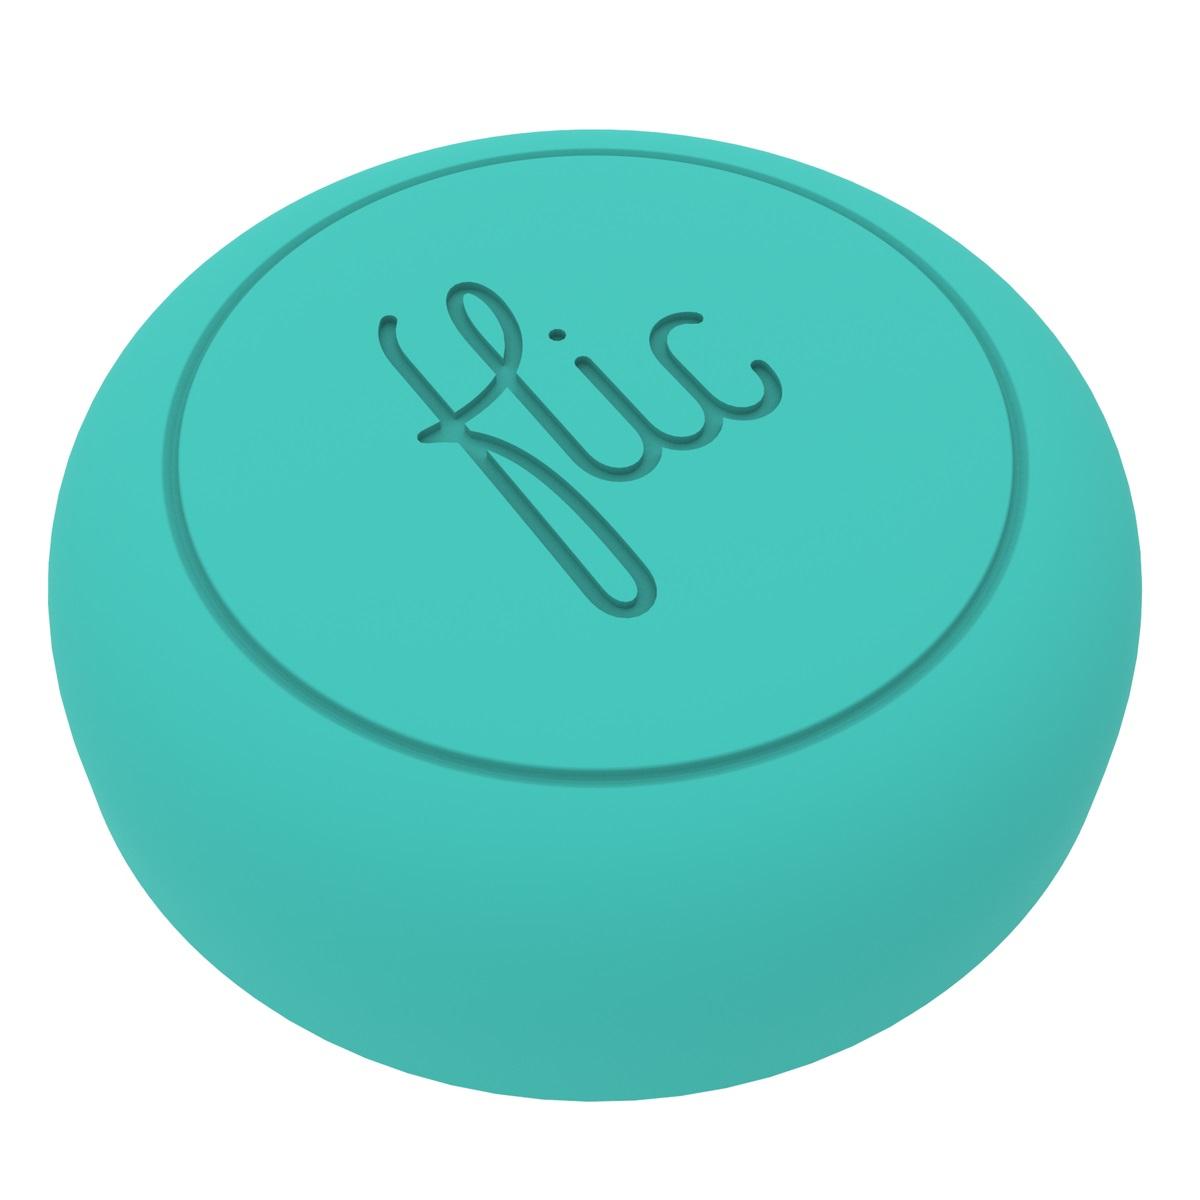 Flic Wireless Smart button-Turquoise